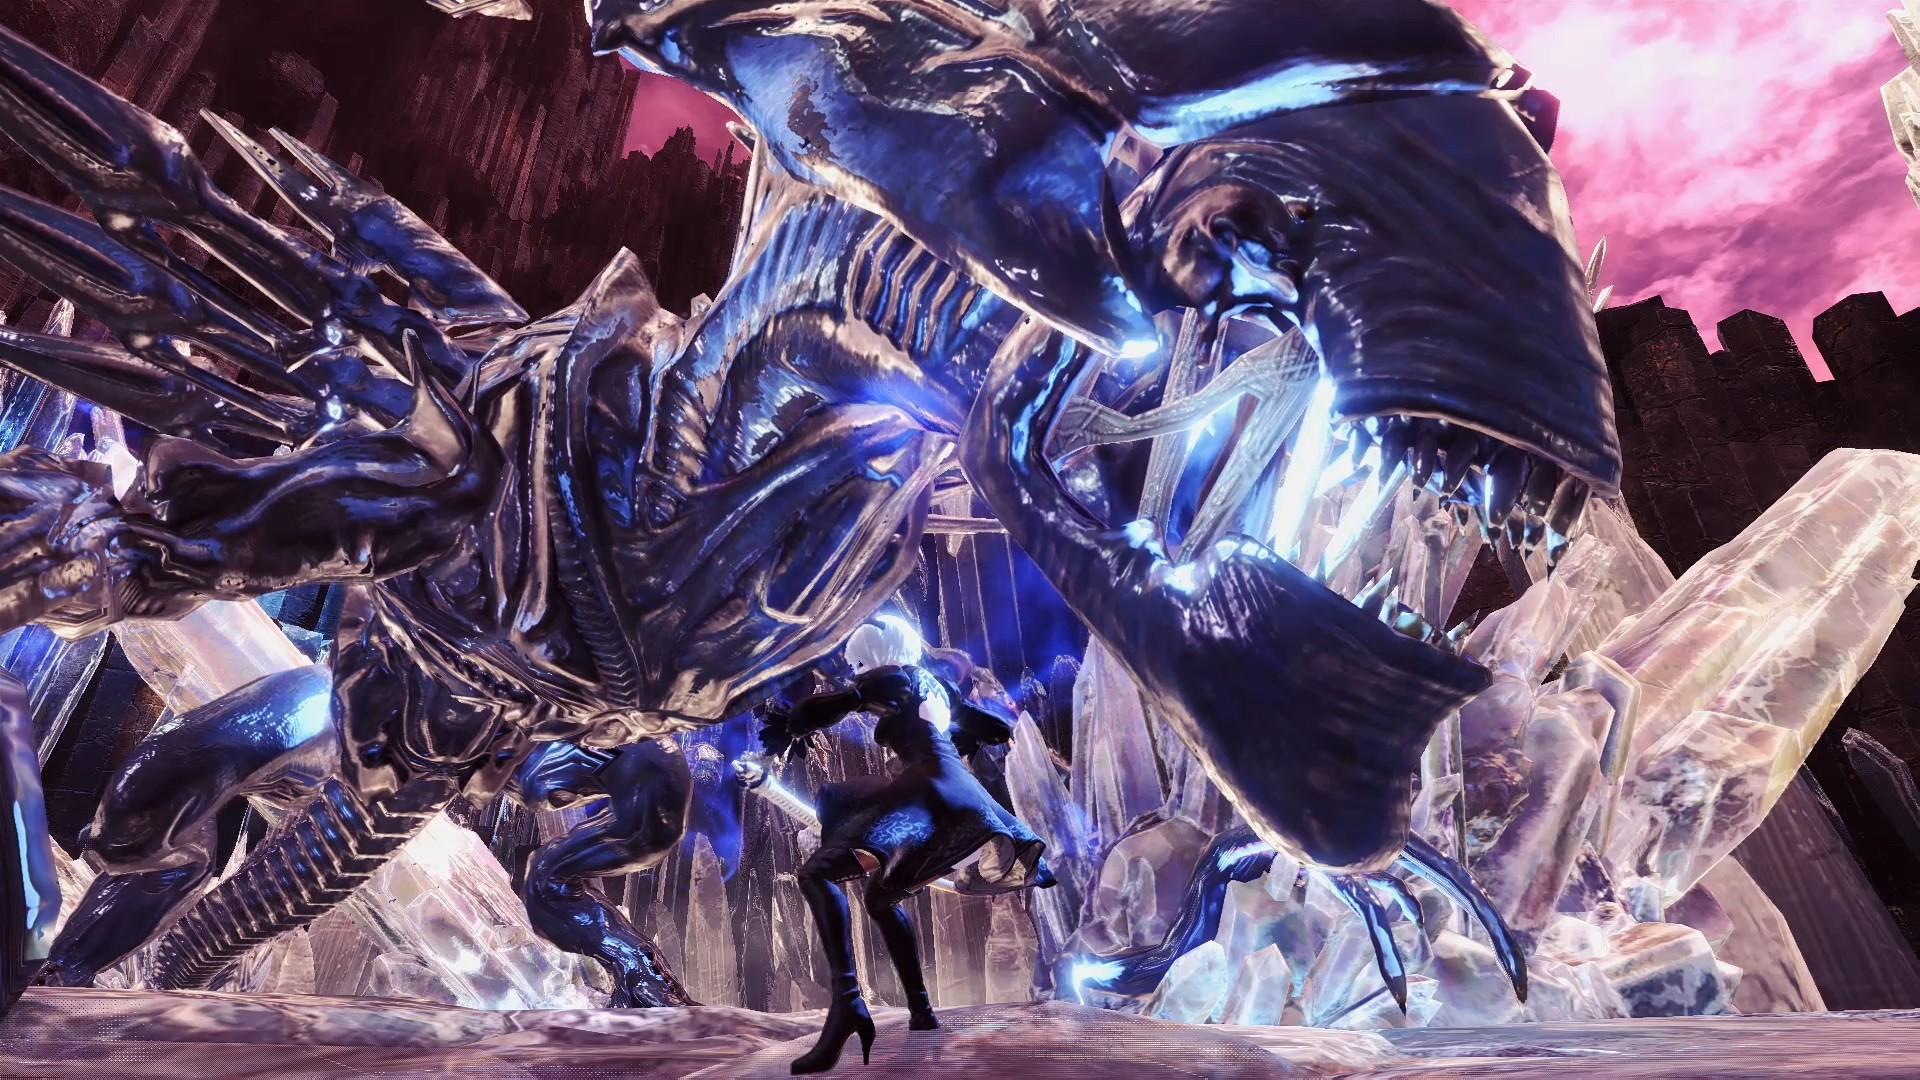 Monster Hunter World Xenomorph 2467203 Hd Wallpaper